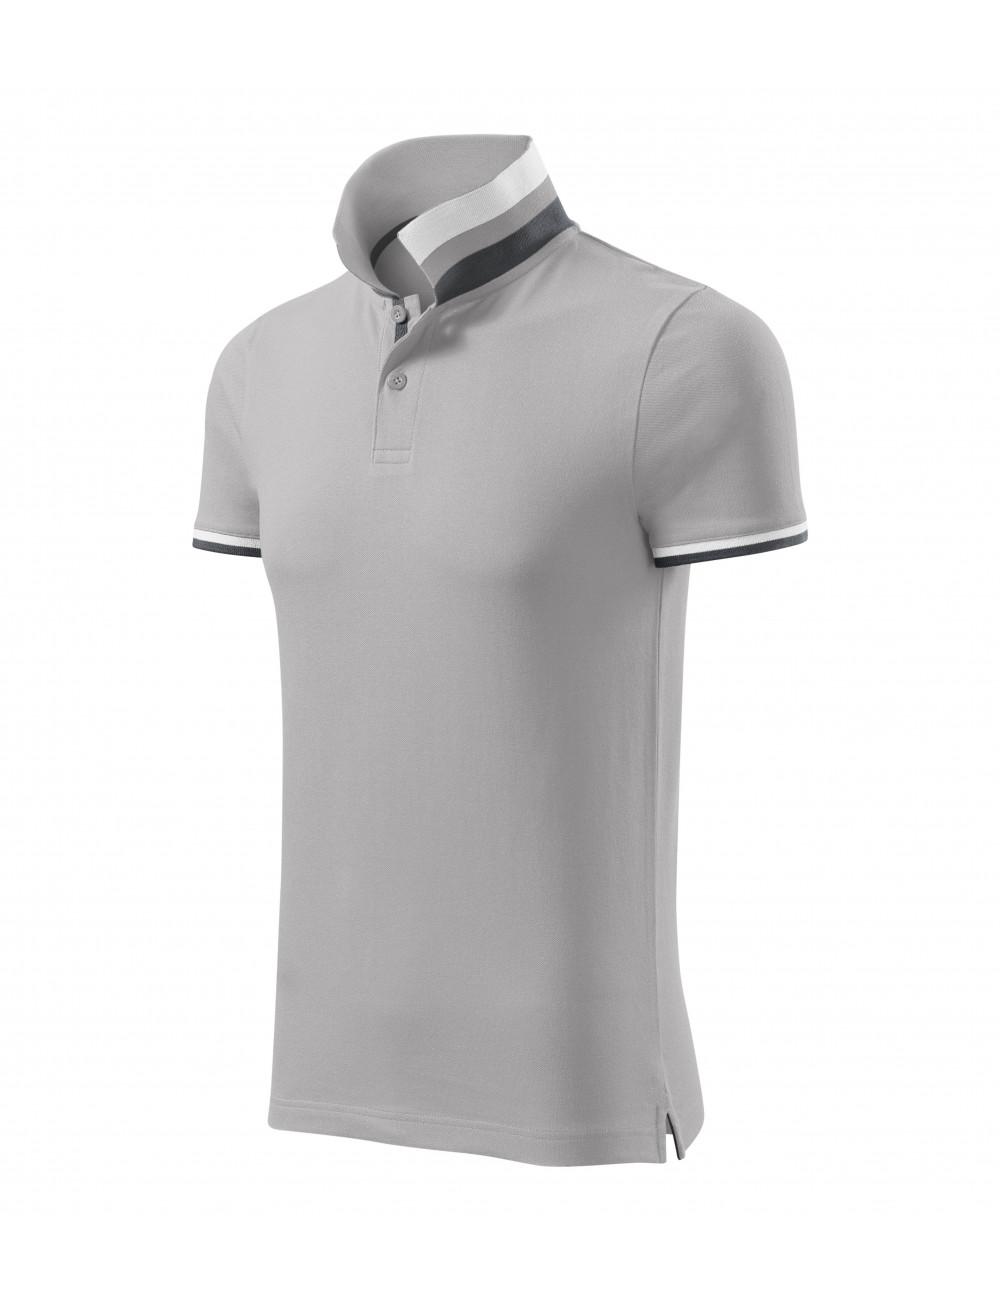 Adler MALFINIPREMIUM Koszulka polo męska Collar Up 256 silver gray